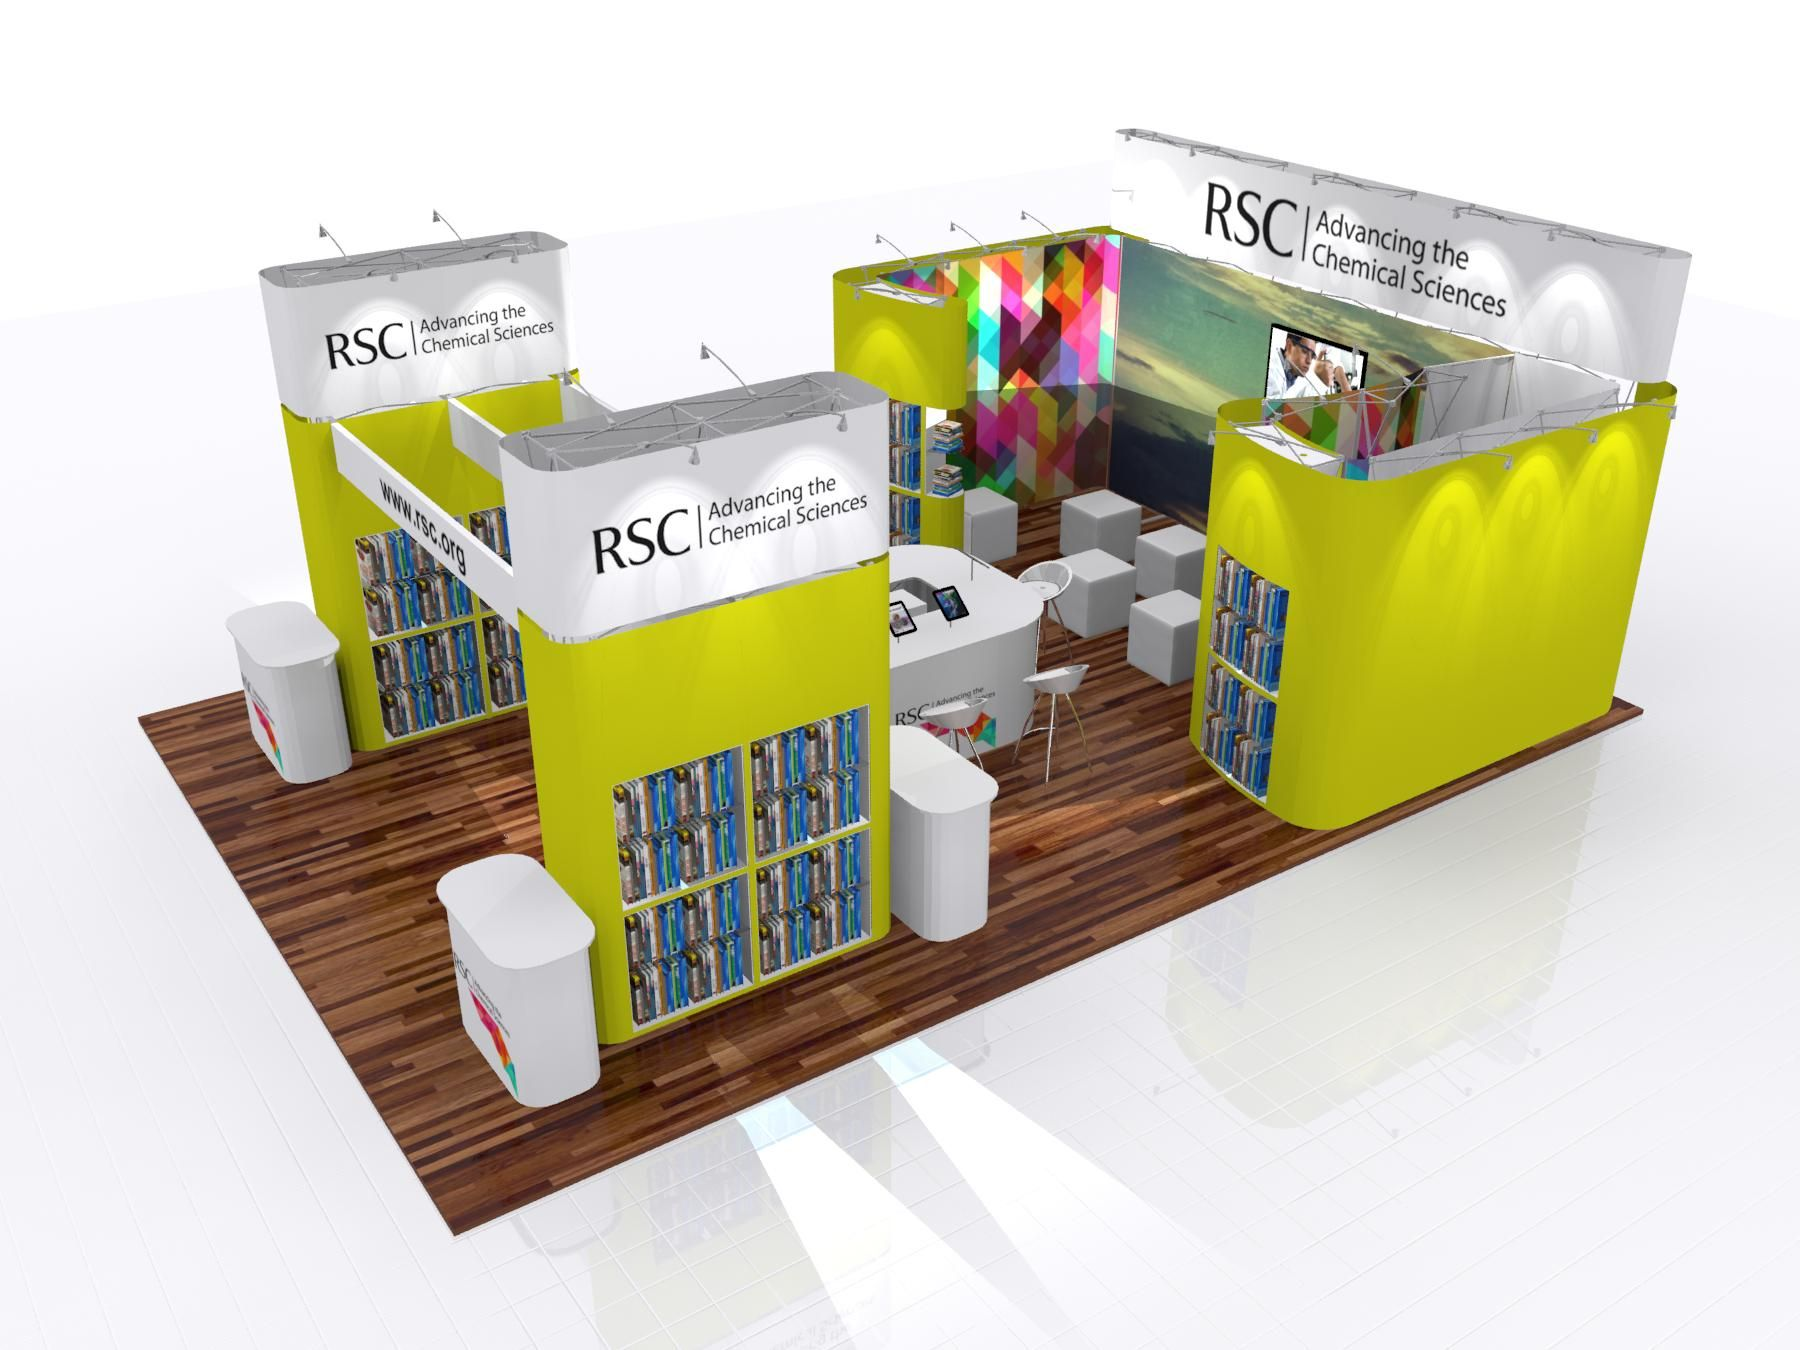 Exhibition Stand Synonym : Prestige exhibition stand design exhibitions exhibition stand